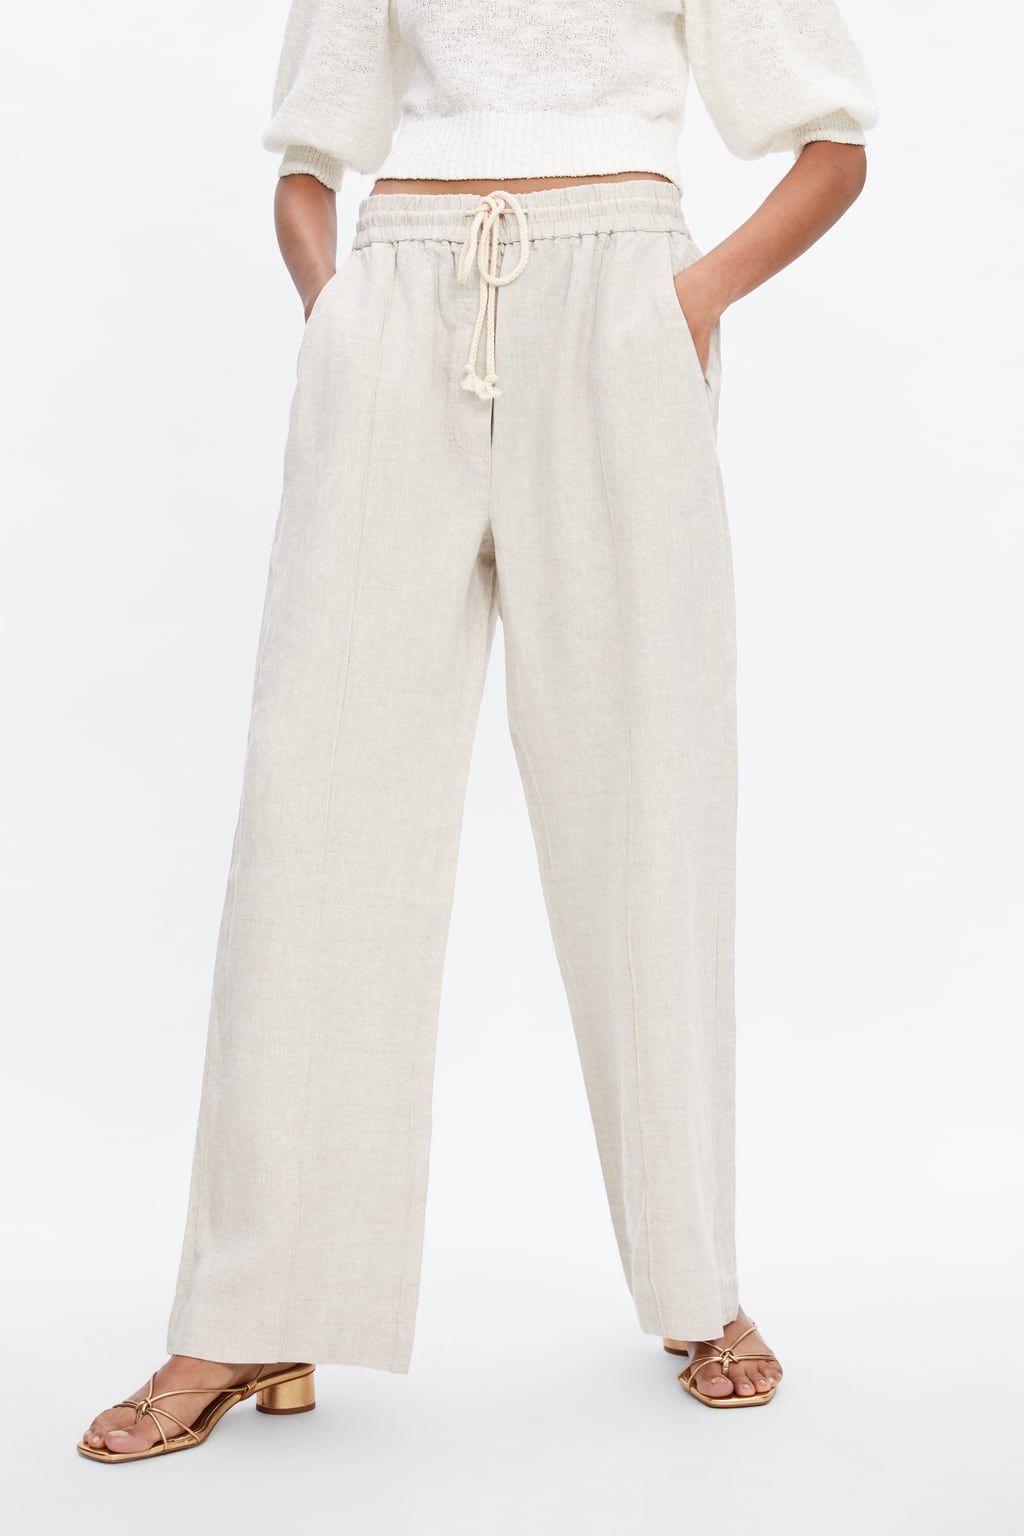 Pantalon Lino Ver Todo Pantalones Mujer Zara Espana Pantalones De Lino Pantalon Lino Mujer Ropa